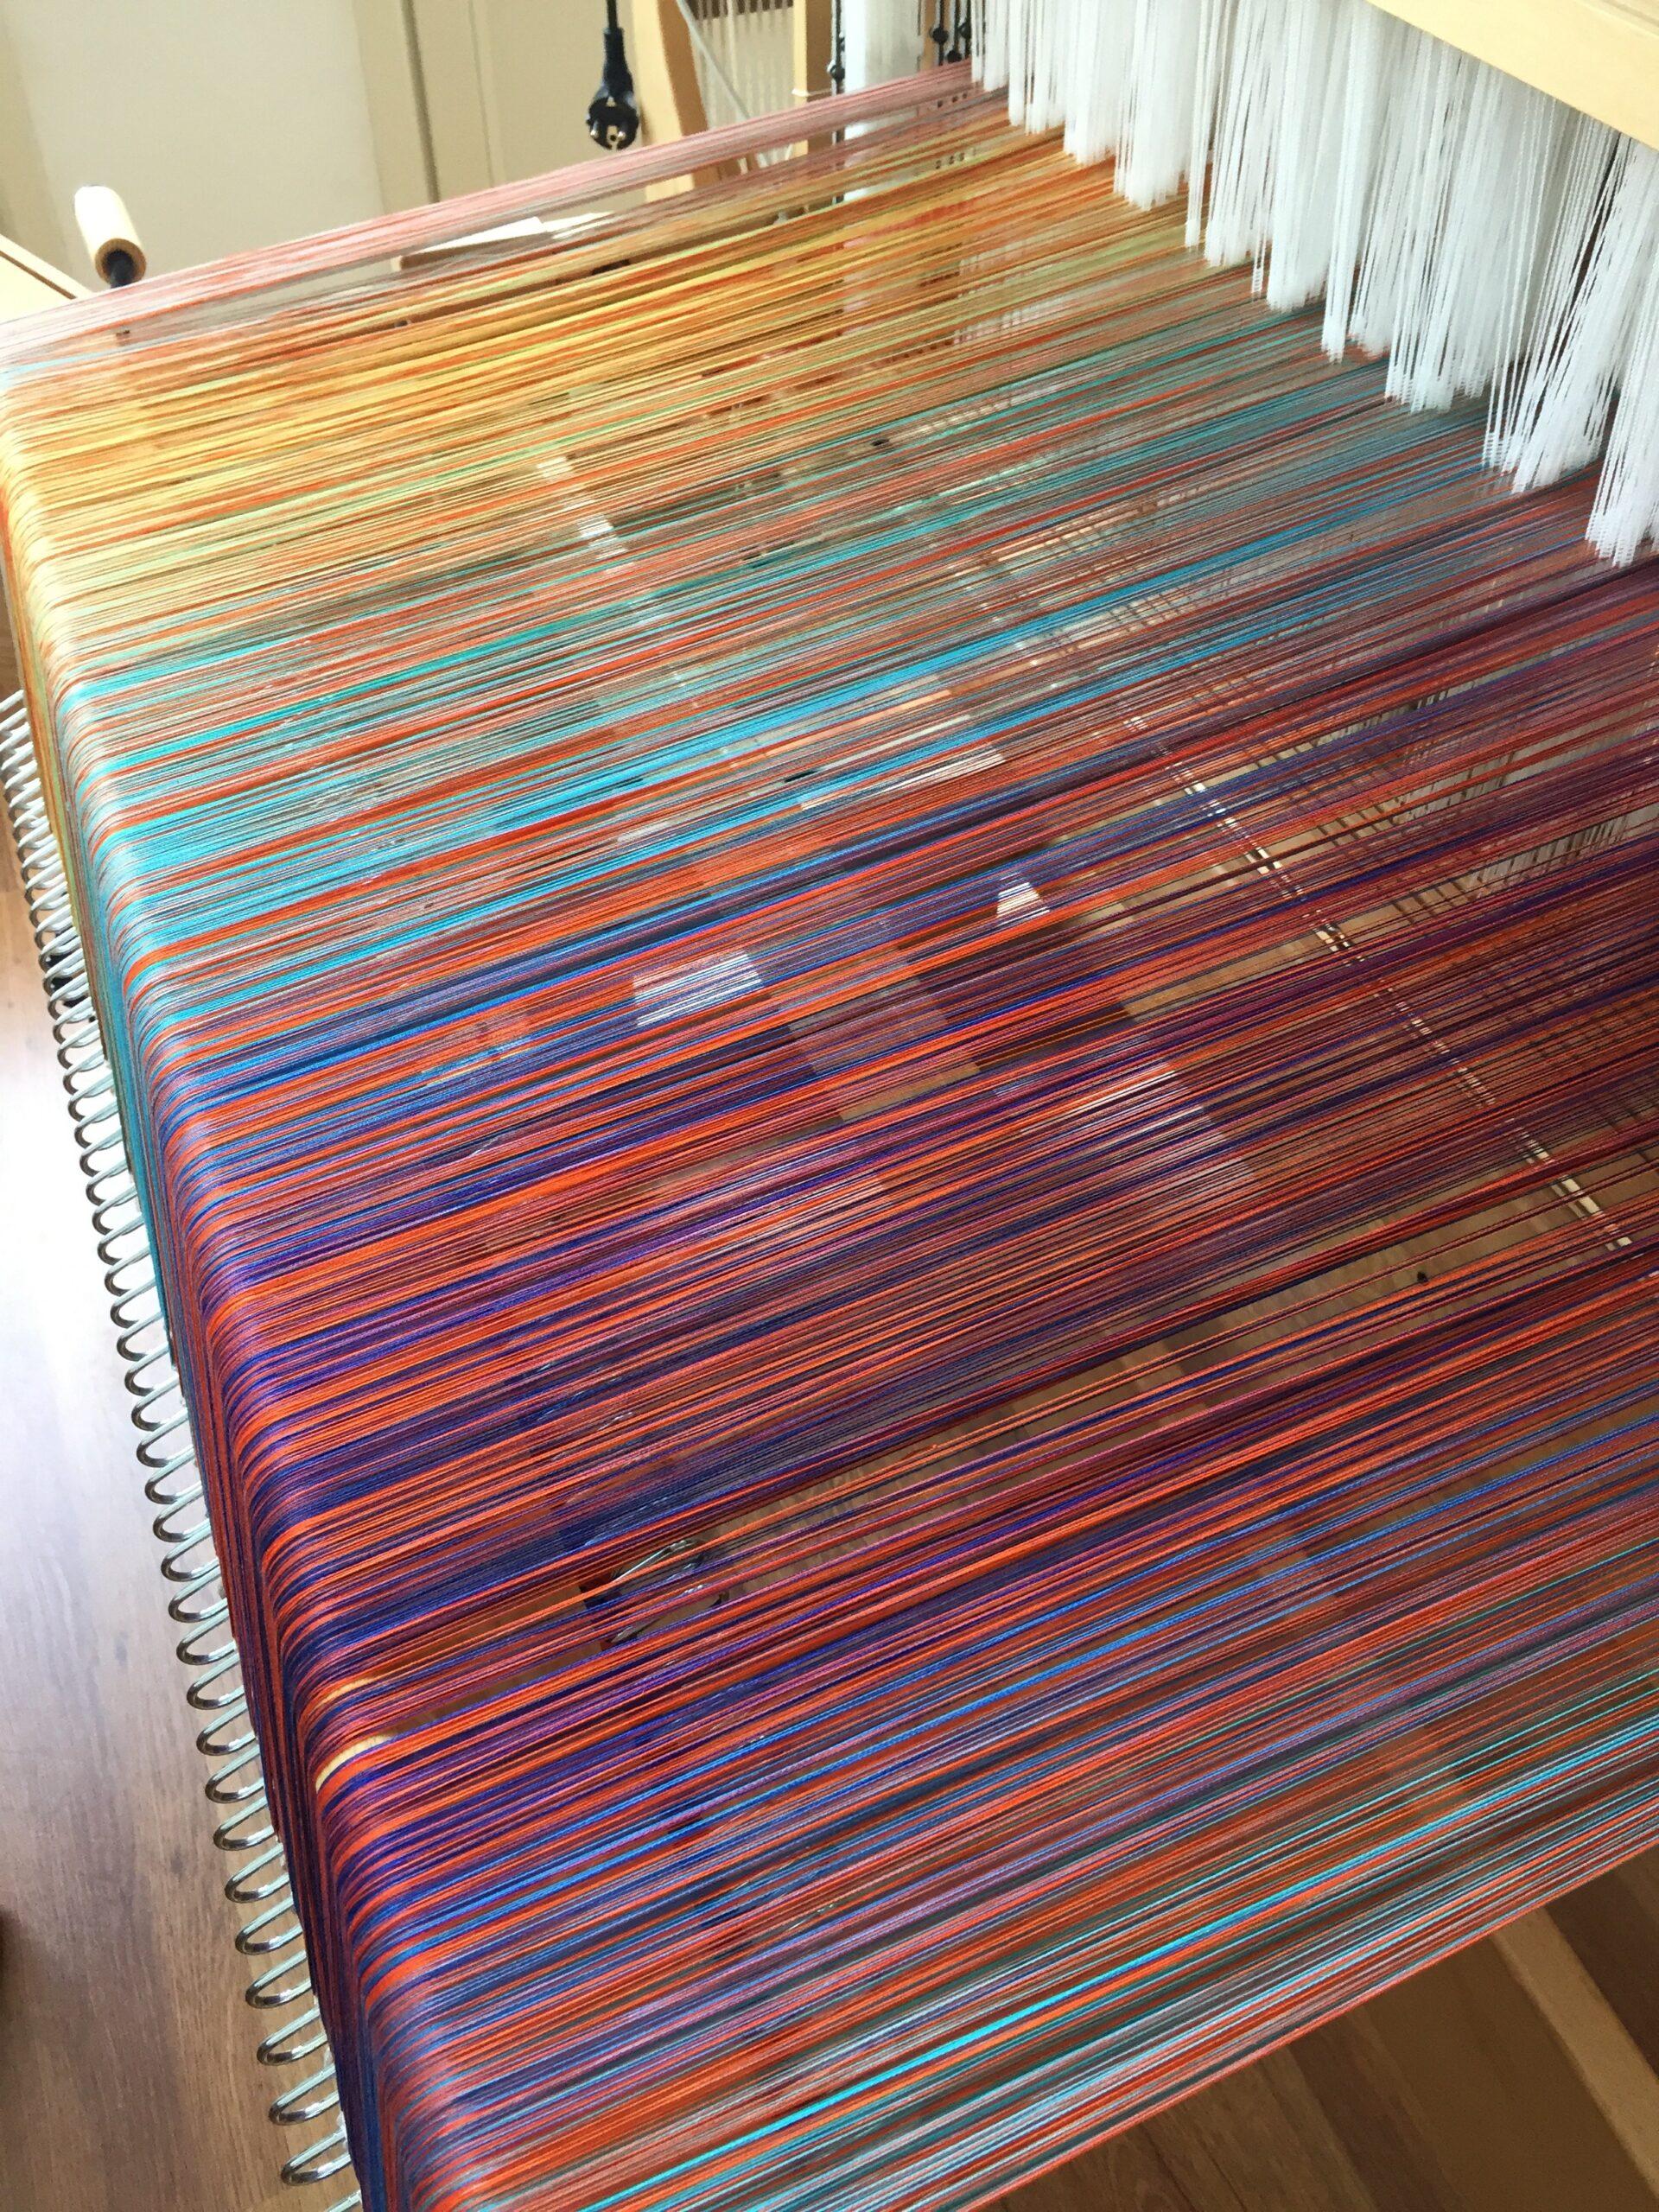 a warp on the loom